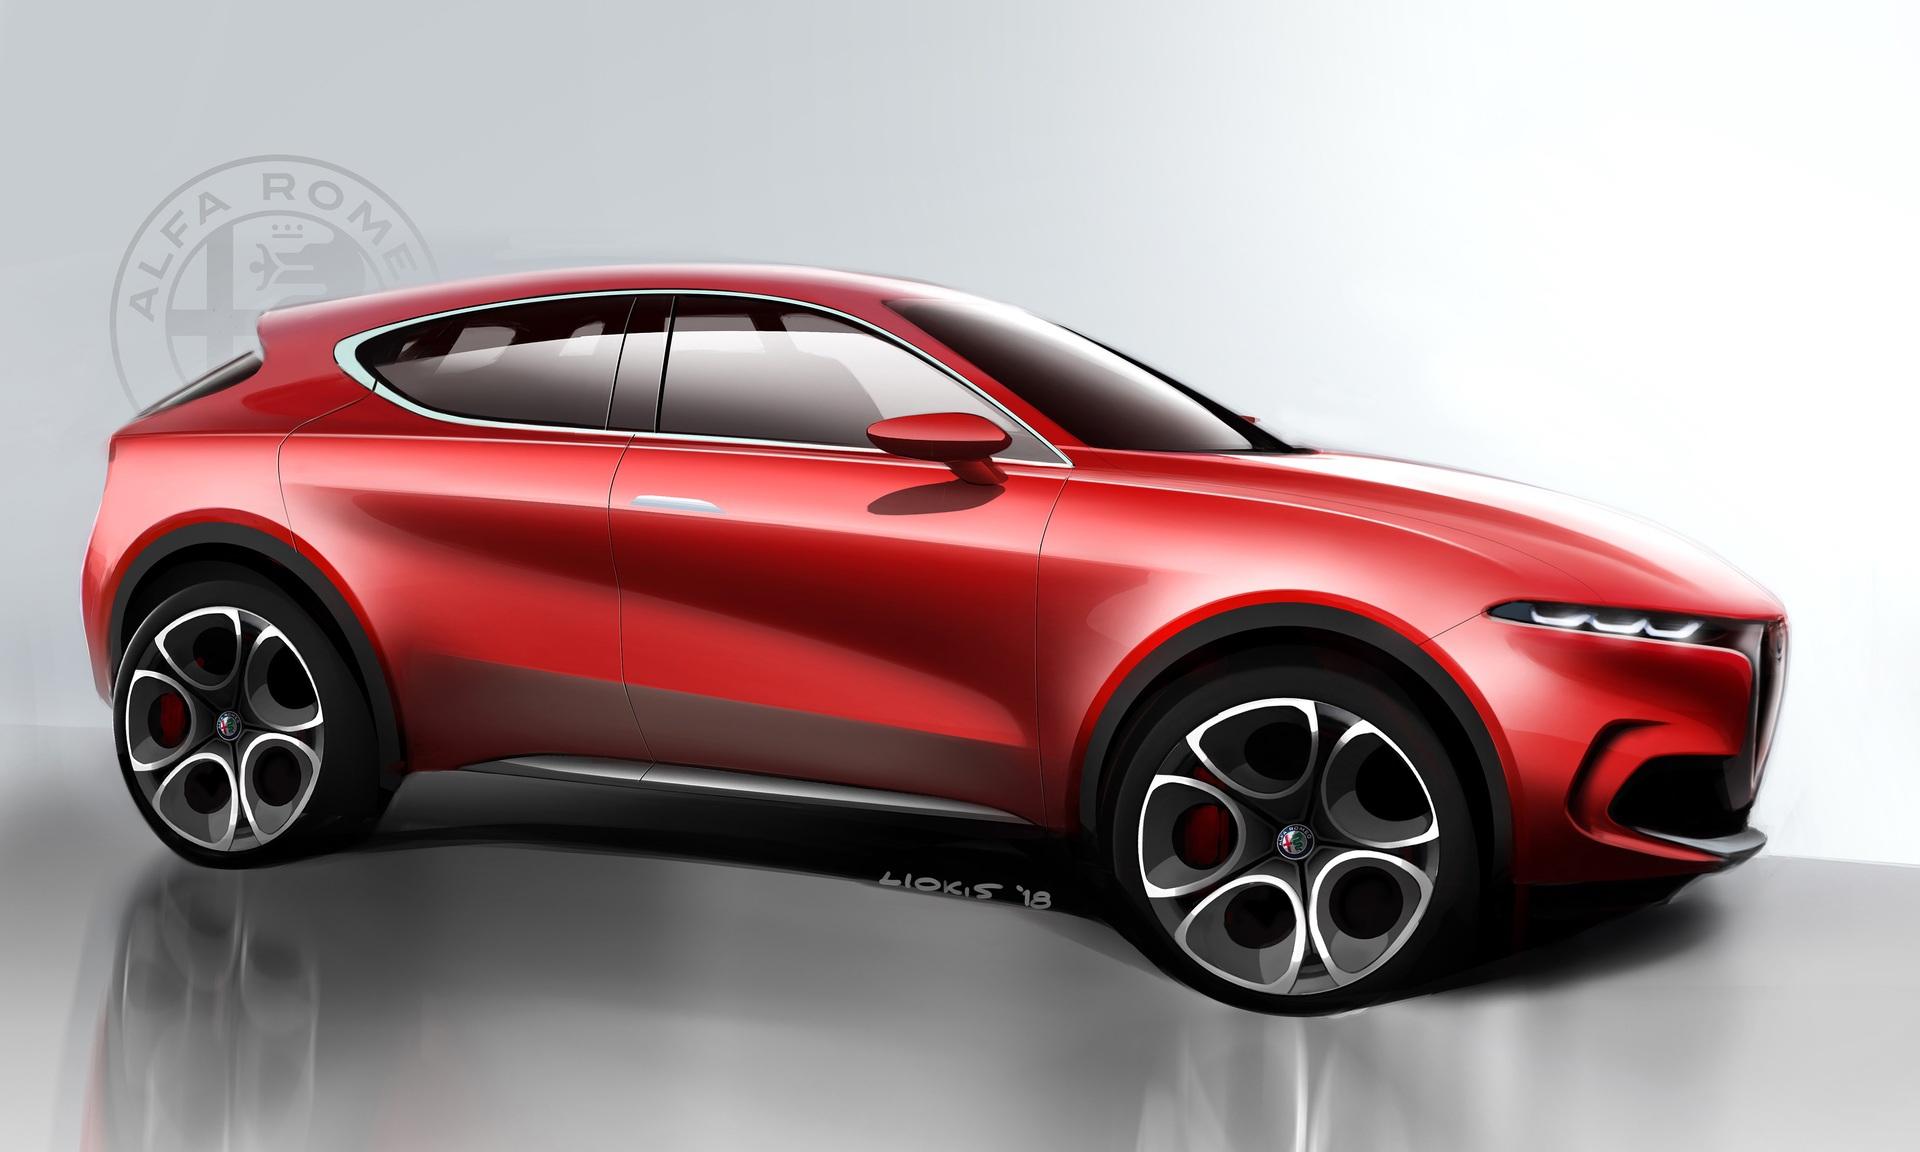 Alfa_Romeo_Tonale_Concept_0003